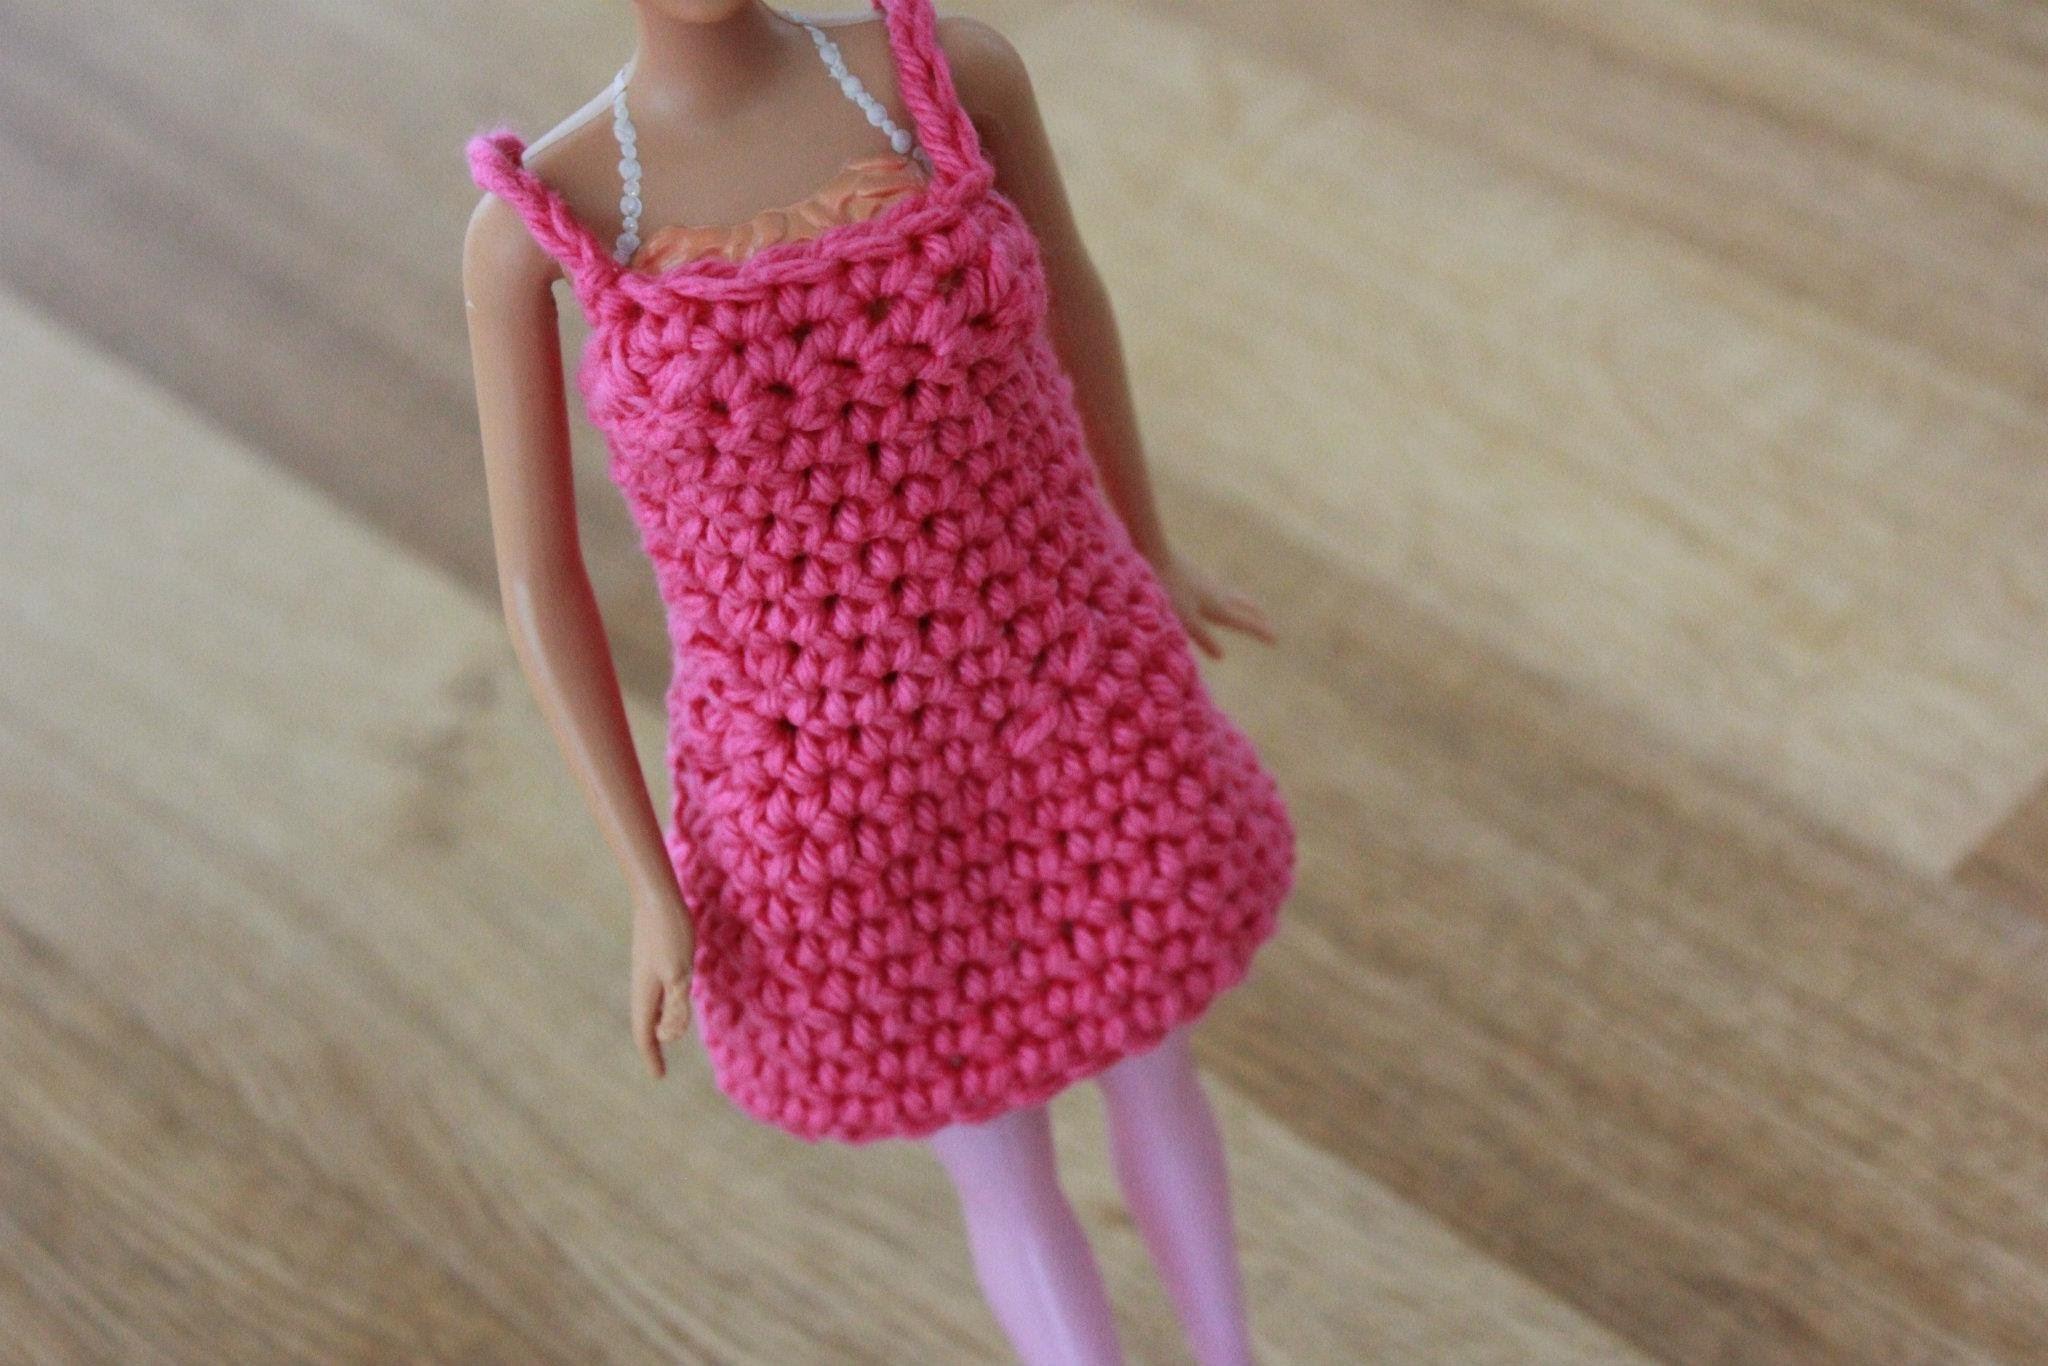 Crochet Barbie Dress Tutorial Pattern - Right Handed